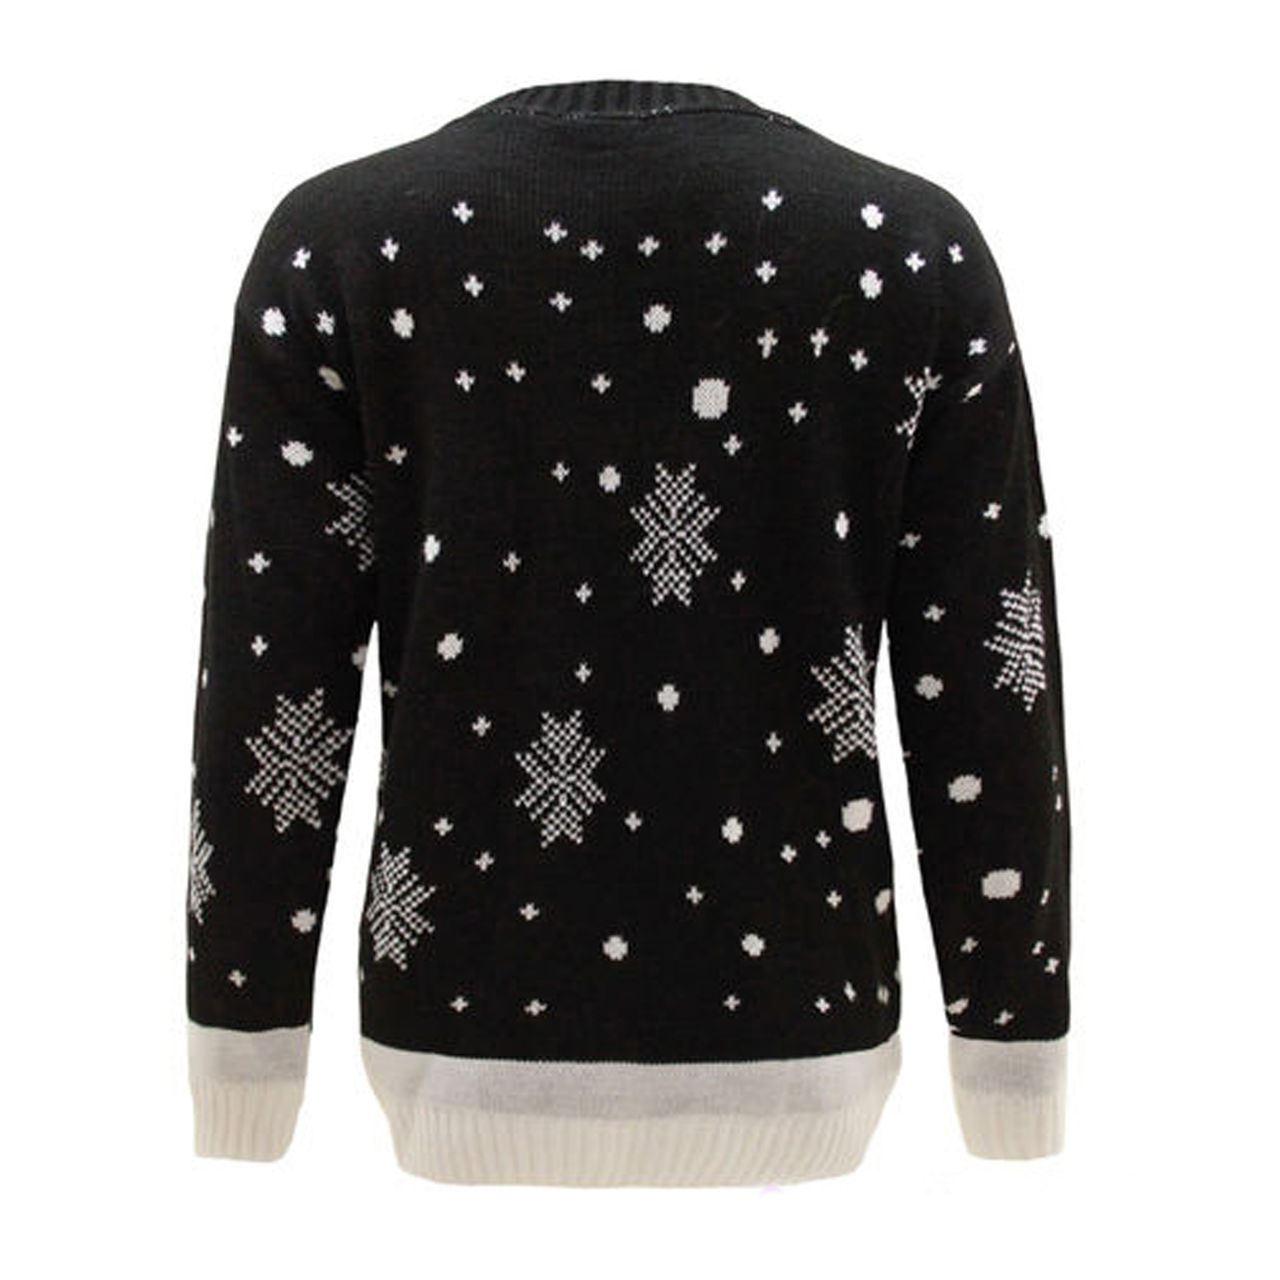 New-Ladies-Women-Men-Knitted-Rudolph-Reindeer-Xmas-Christmas-Jumper-Sweater-Top thumbnail 3